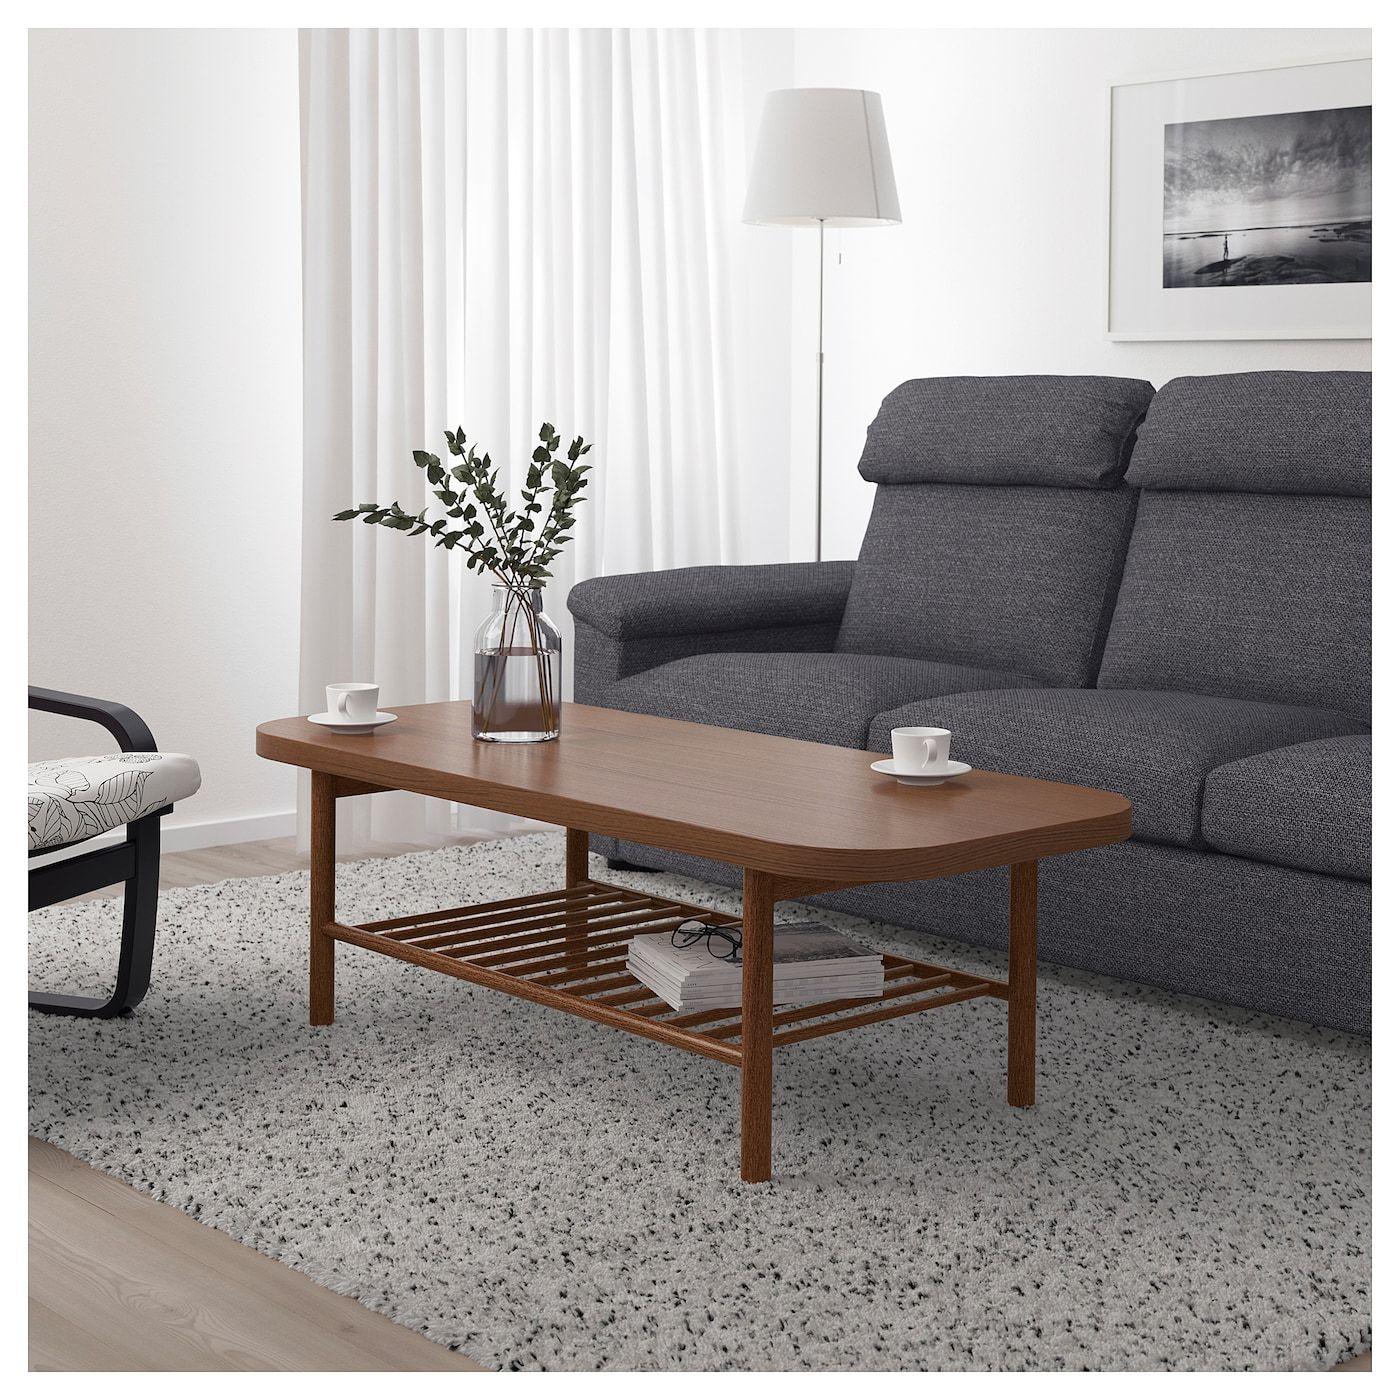 Listerby Soffbord Brun 140x60 Cm Ikea Kaffebord Soffbord Ikea Soffbord [ 1400 x 1400 Pixel ]